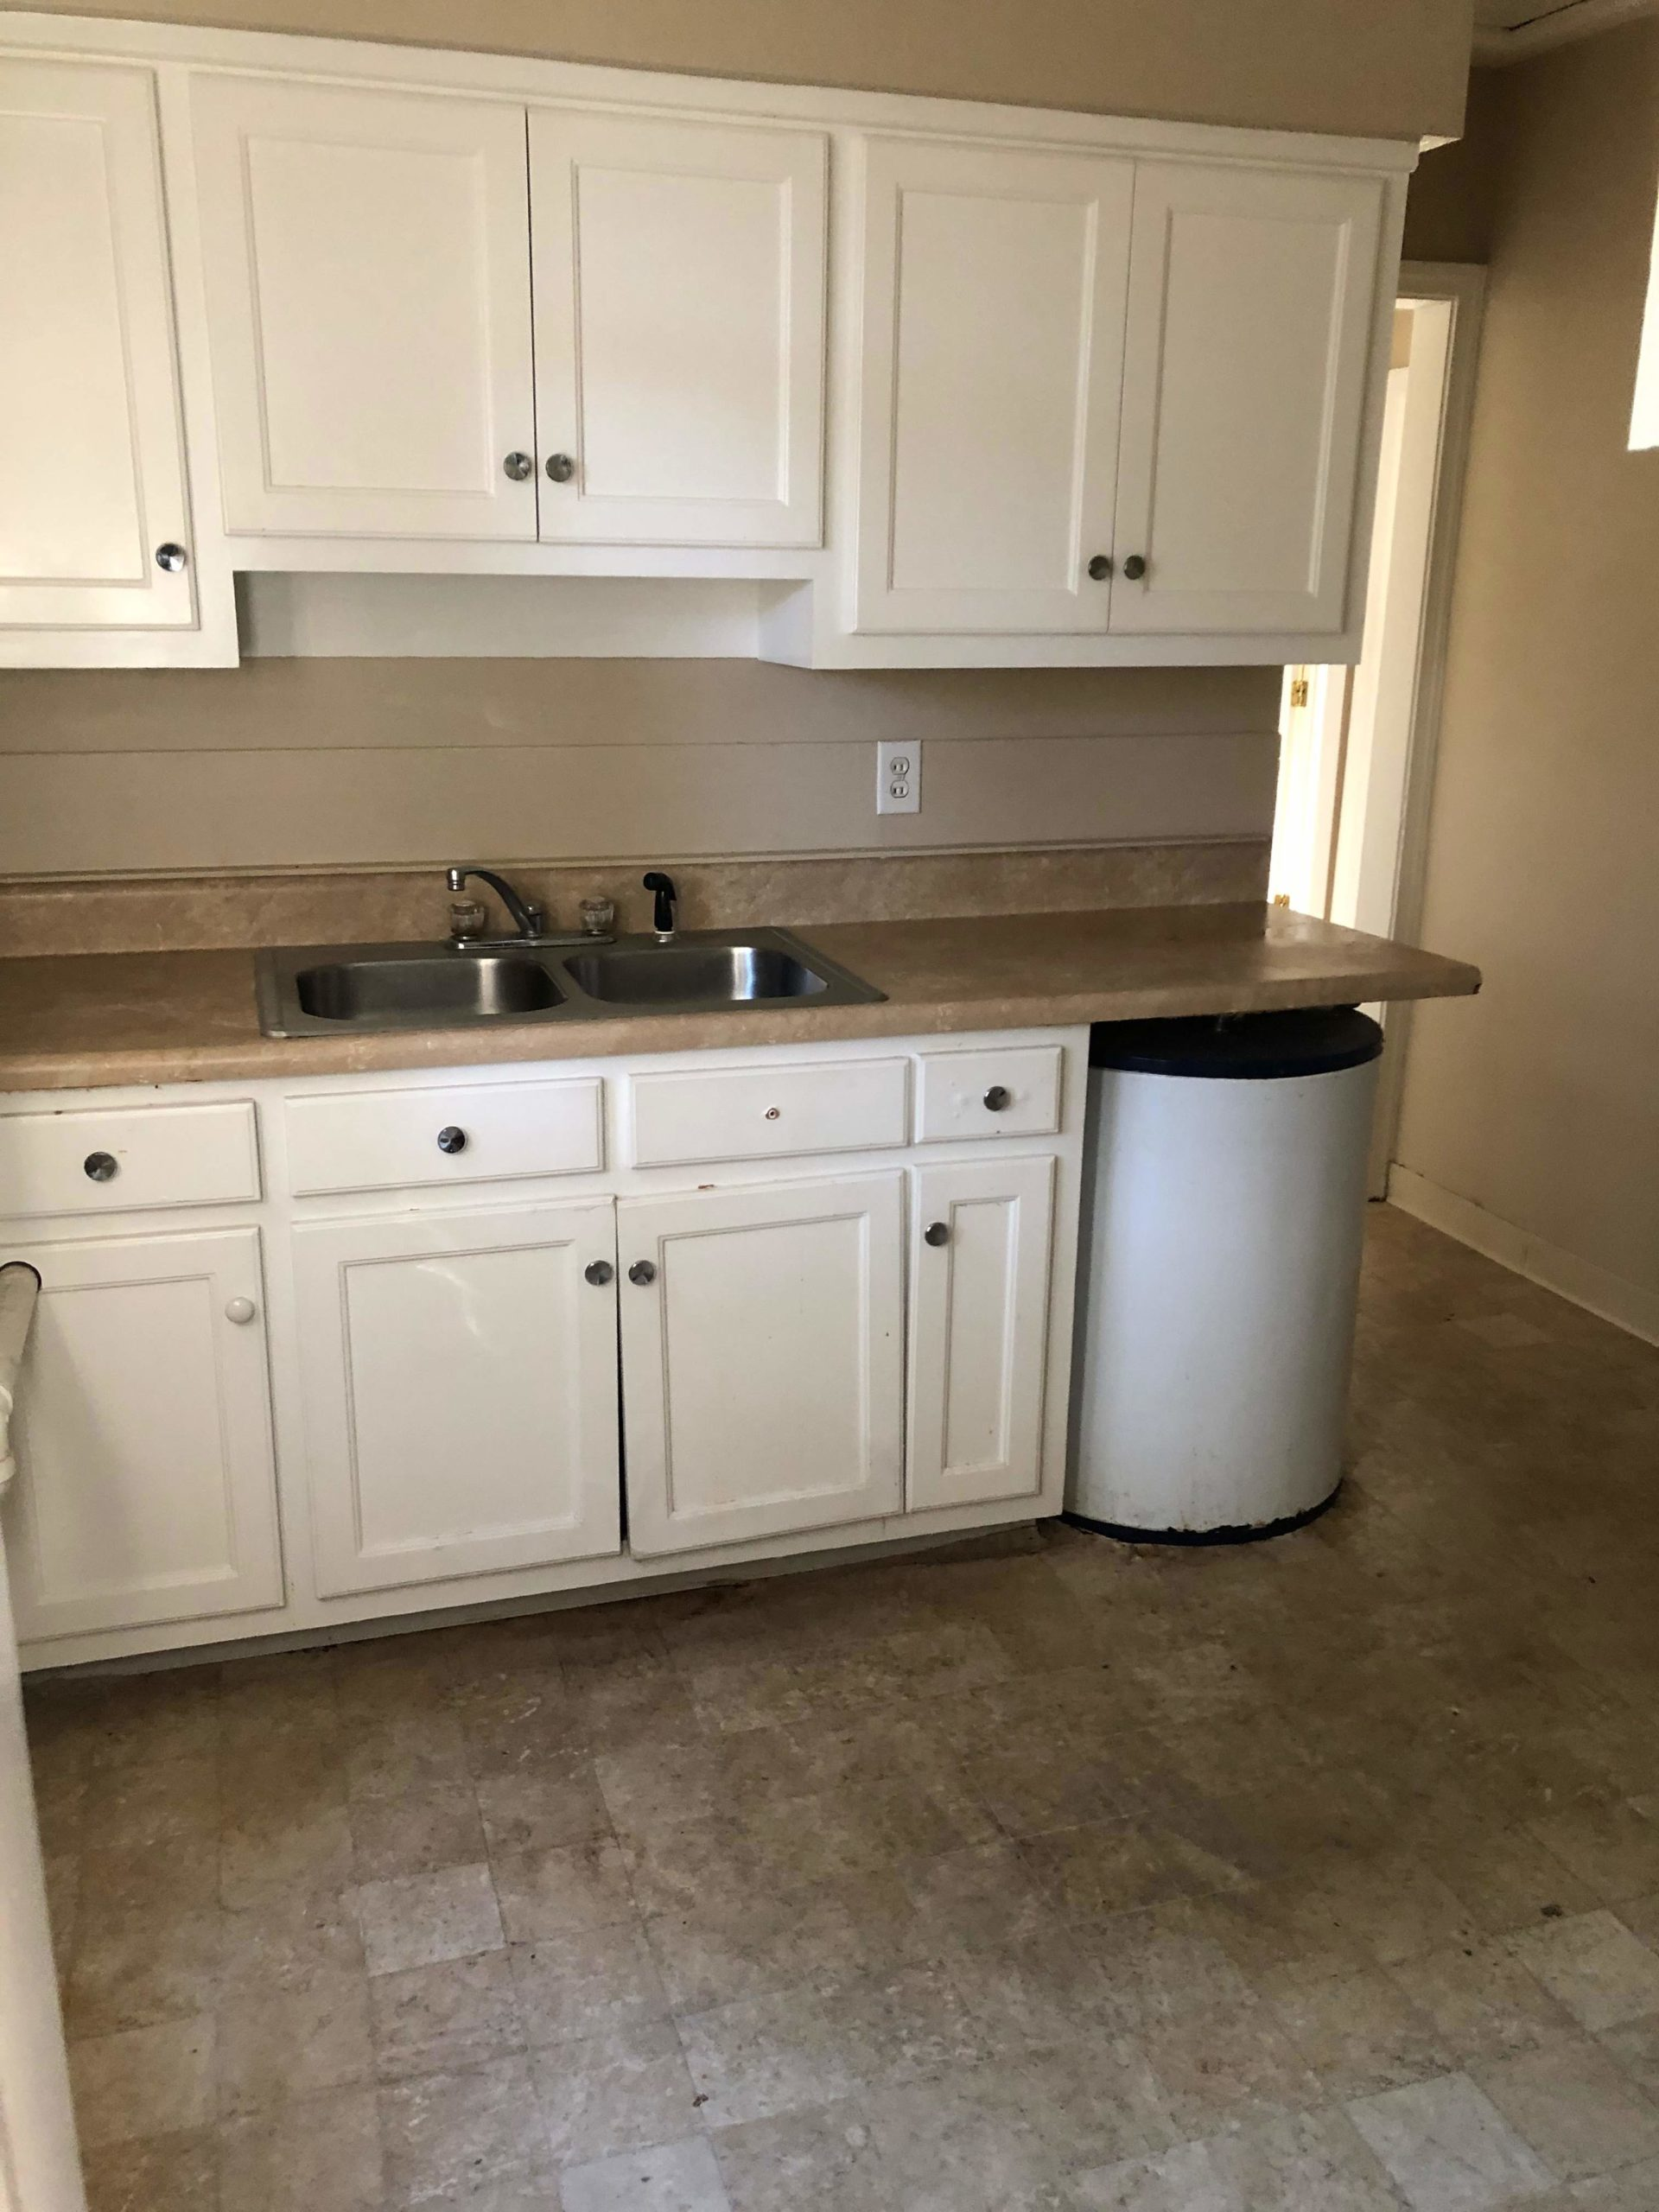 Buy Here Pay Here Macon Ga >> 1008 Carlisle Ave, Macon, GA, 31204 | GA Peach Properties